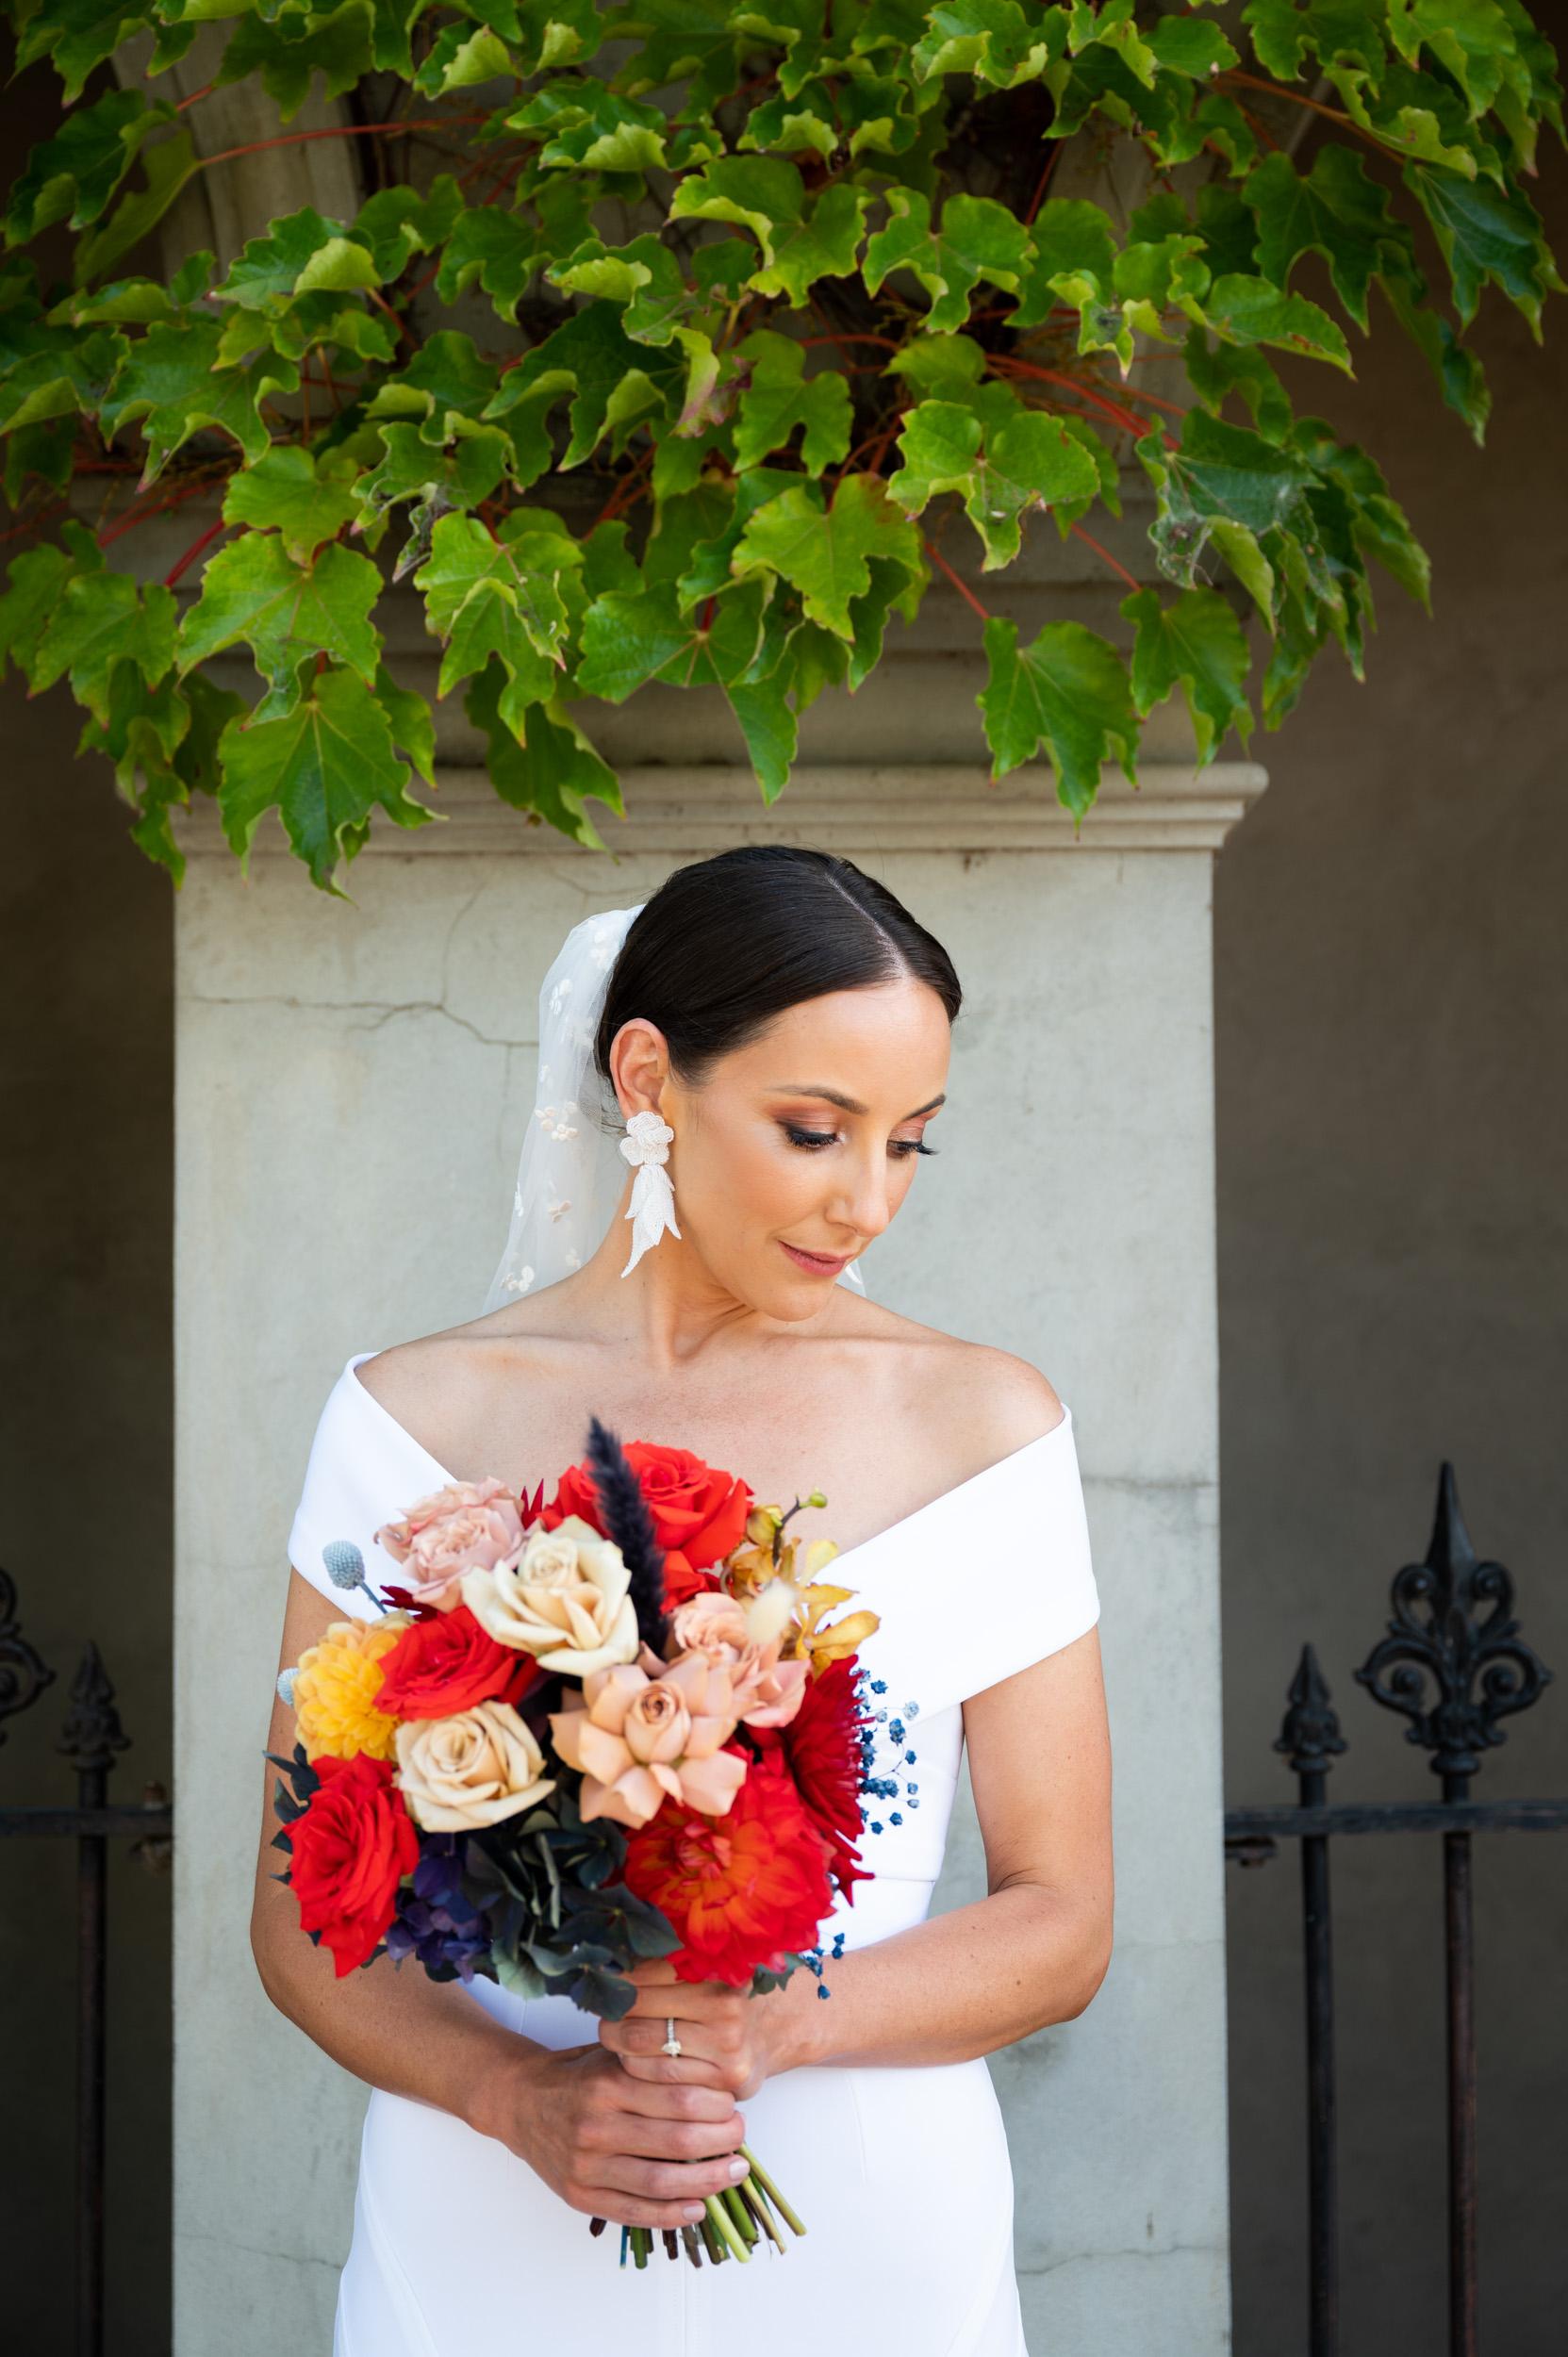 Bride, Wedding, Bouquet, Love Alfalfa Florals, Georgia Young Couture, Melbourne Wedding